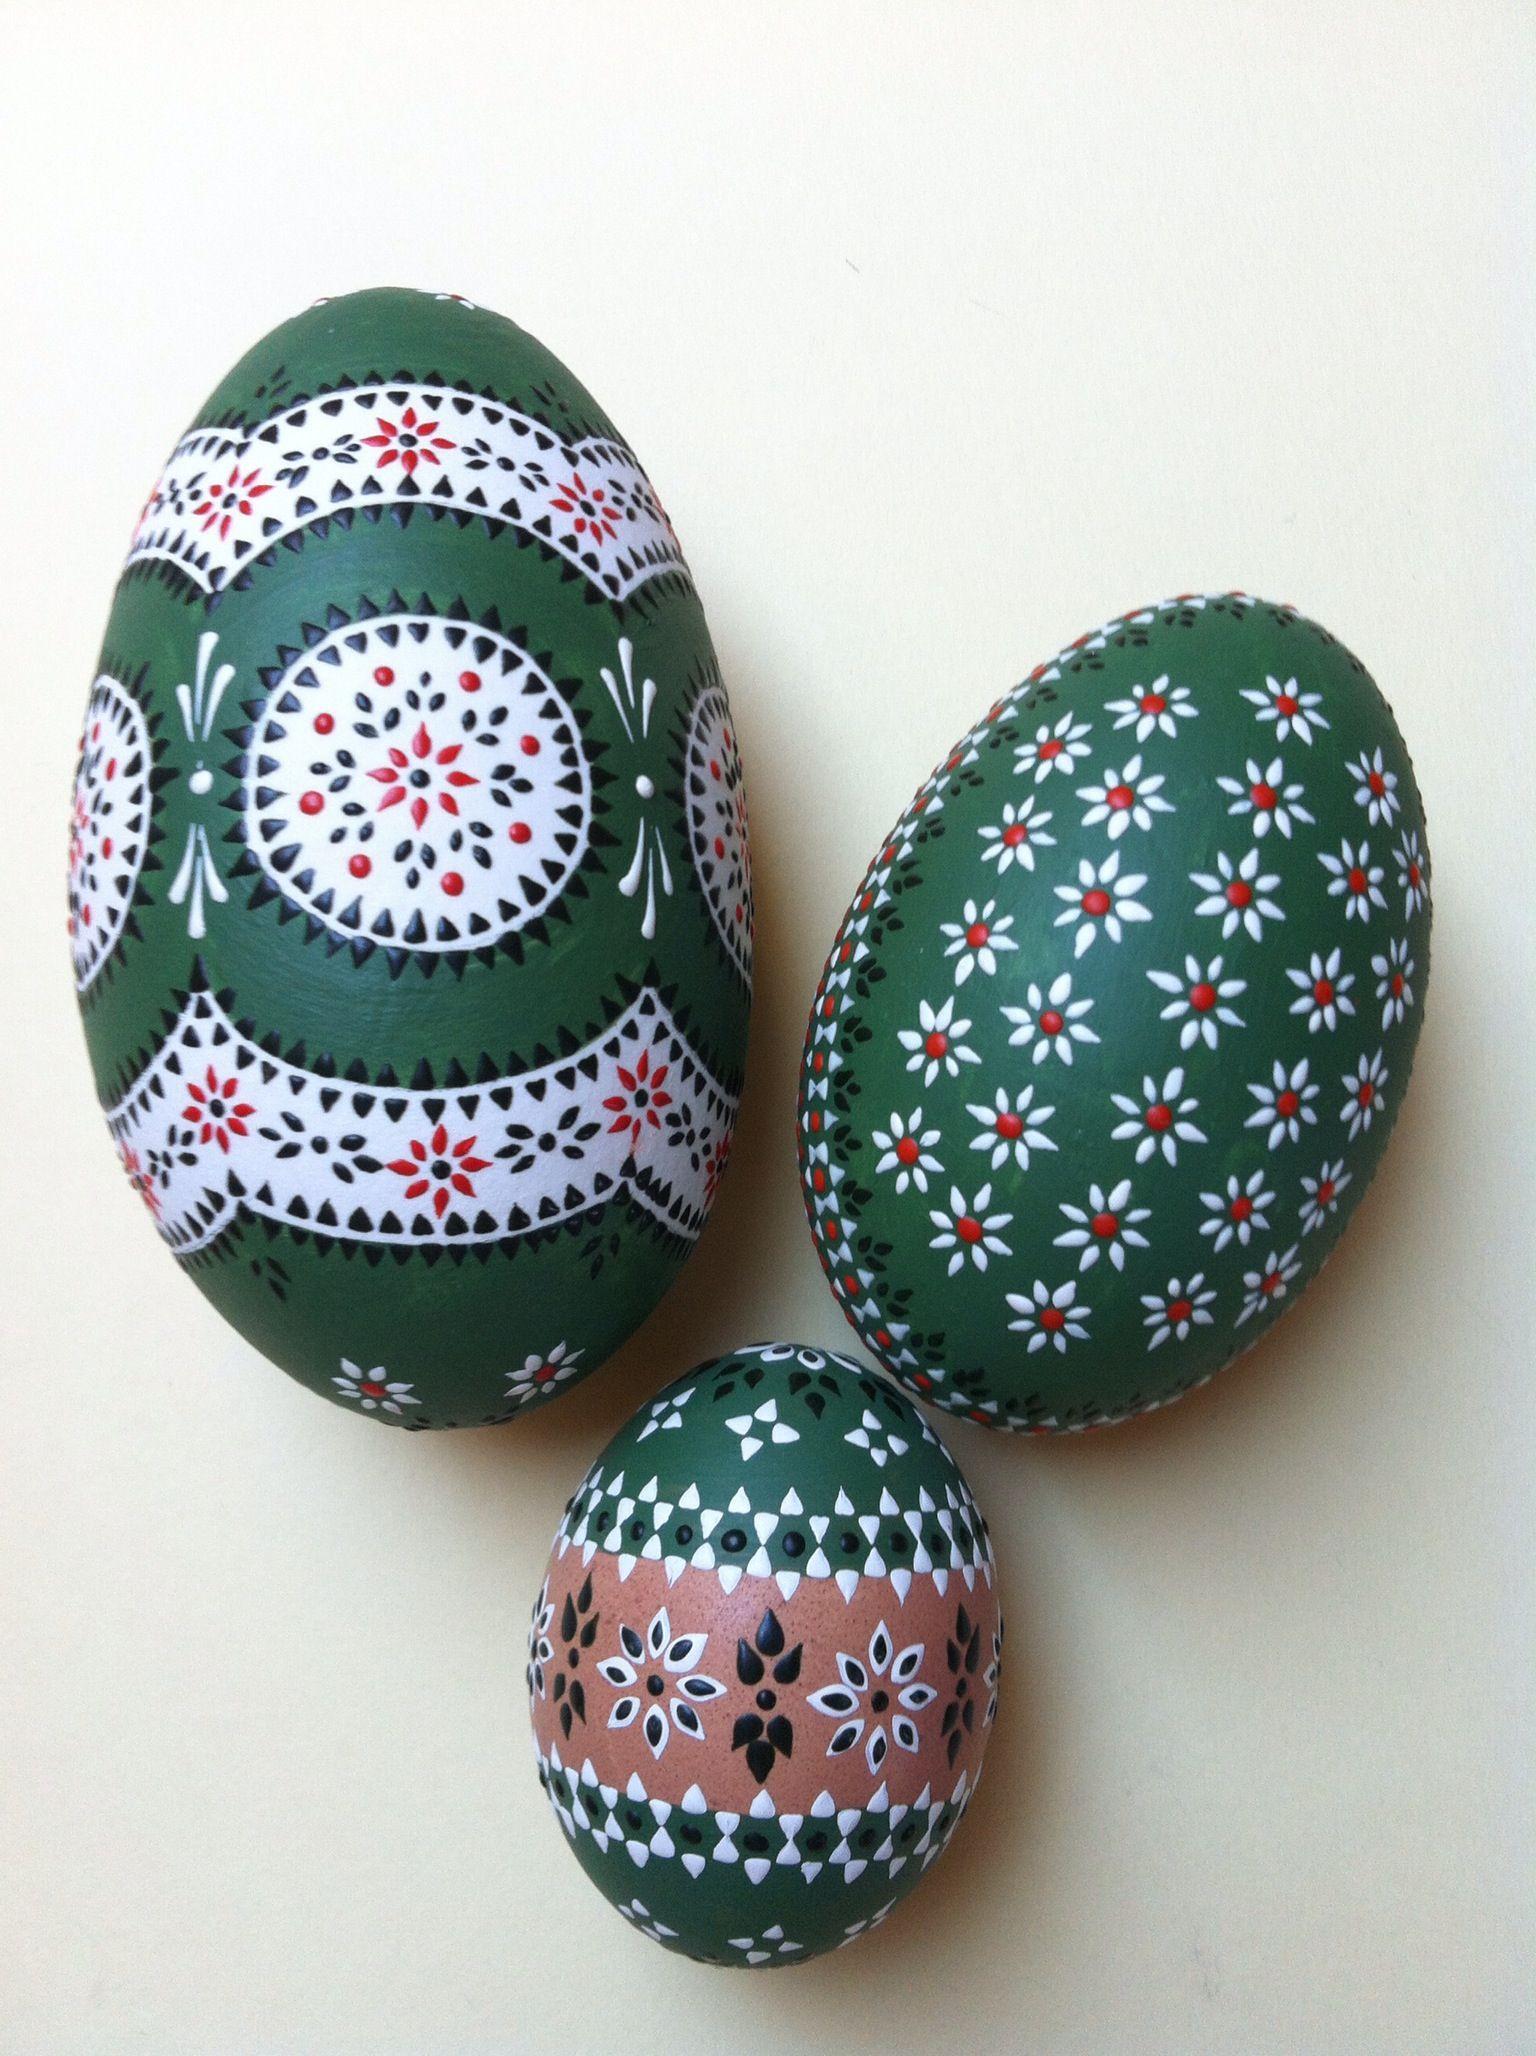 sorbische ostereier sorbian easter eggs ostern. Black Bedroom Furniture Sets. Home Design Ideas